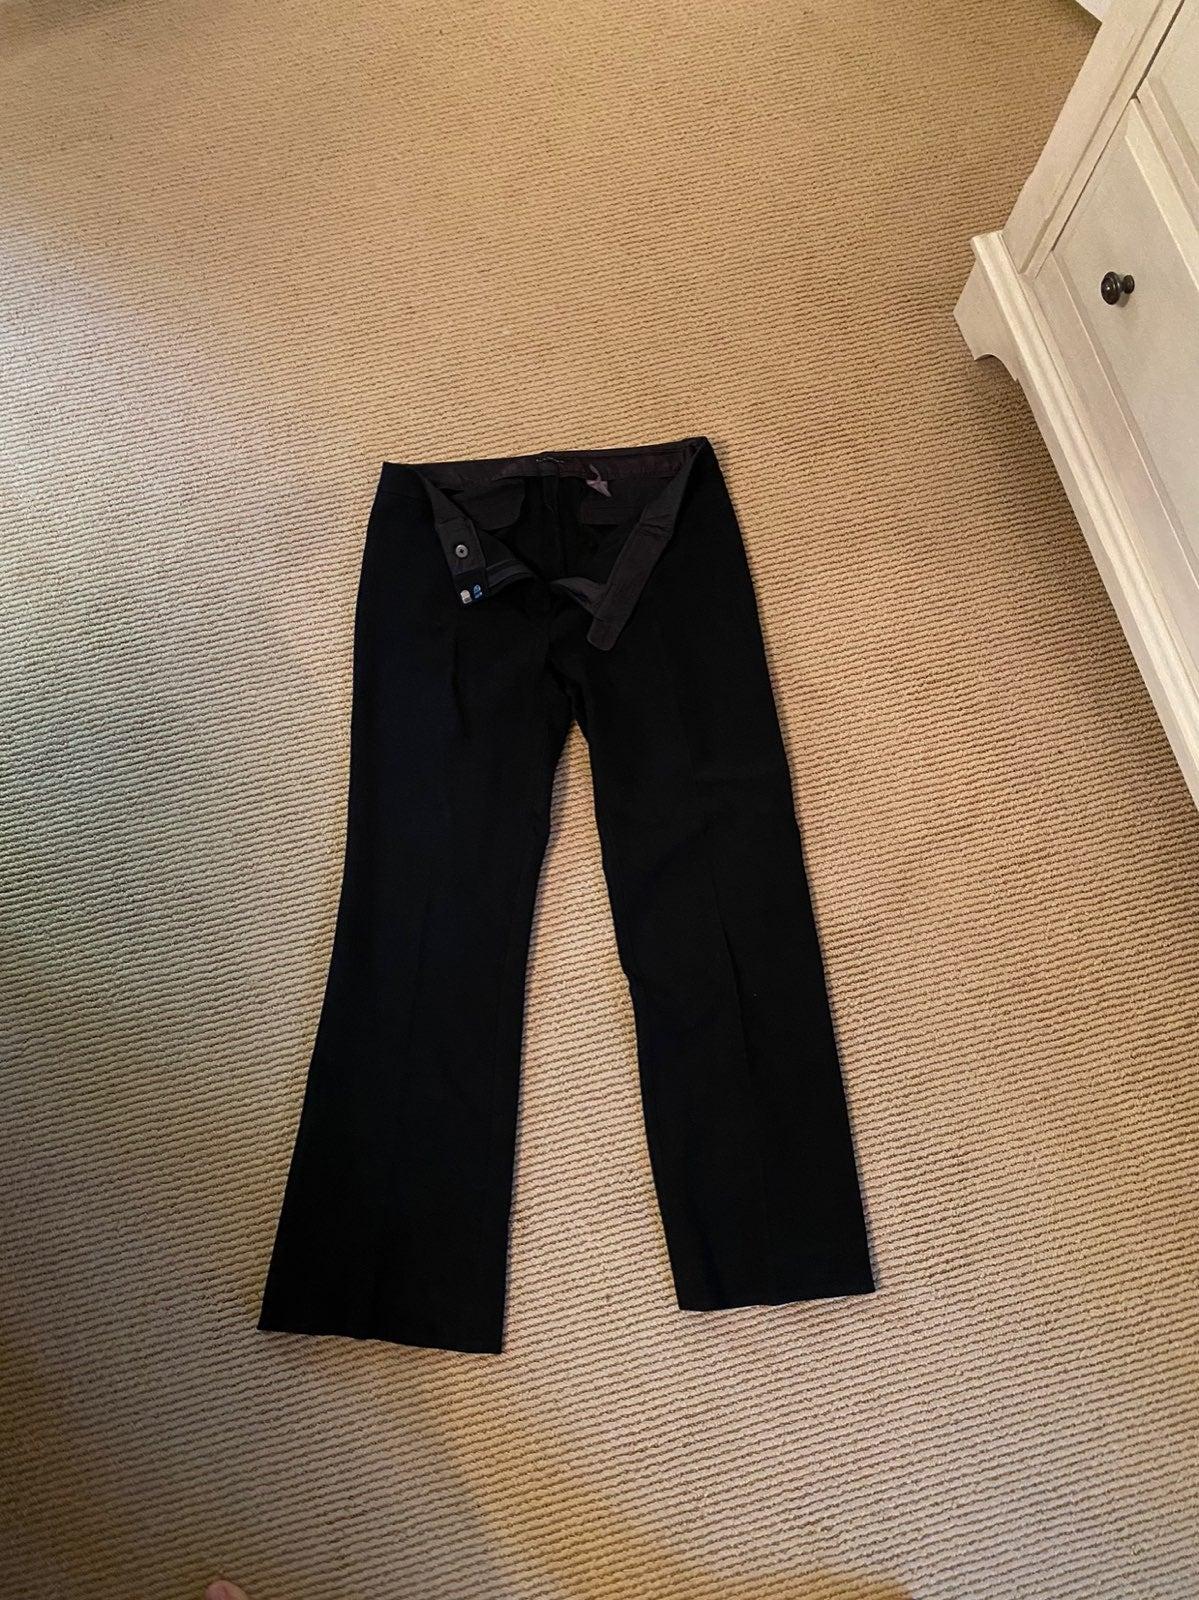 Elie Tahari size 10 dress pants